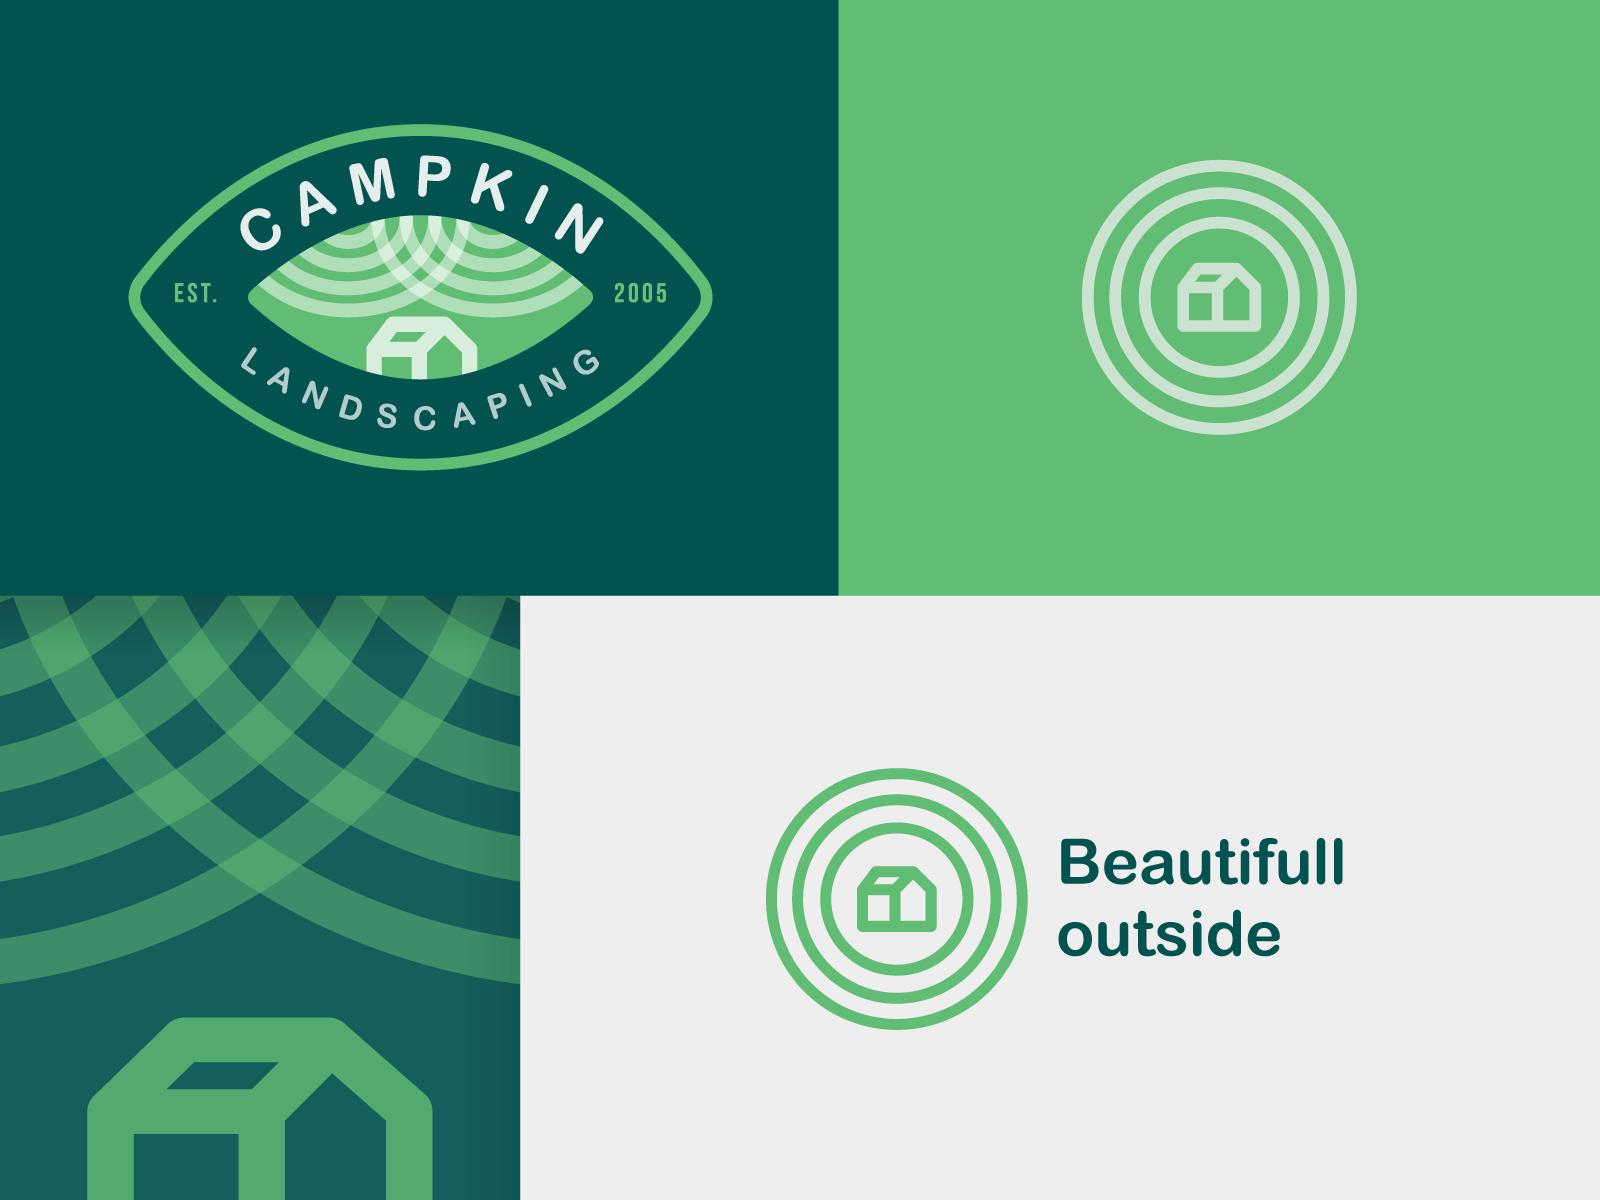 Campkin Landscaping Final Logo Landscaping logo